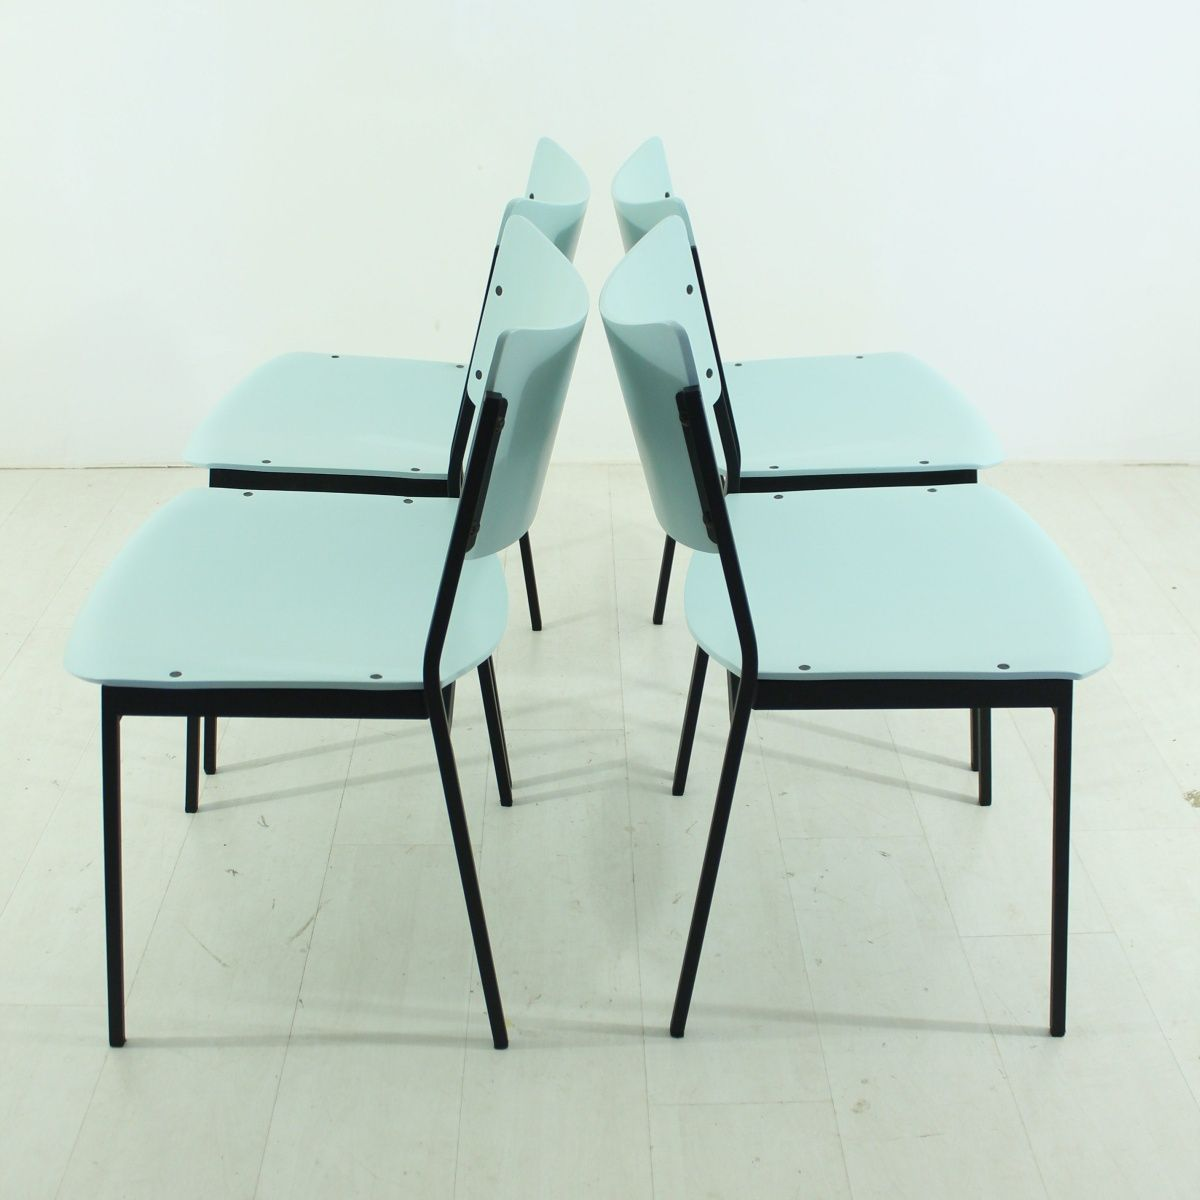 vintage st hle in minze pastellton 4er set bei pamono kaufen. Black Bedroom Furniture Sets. Home Design Ideas